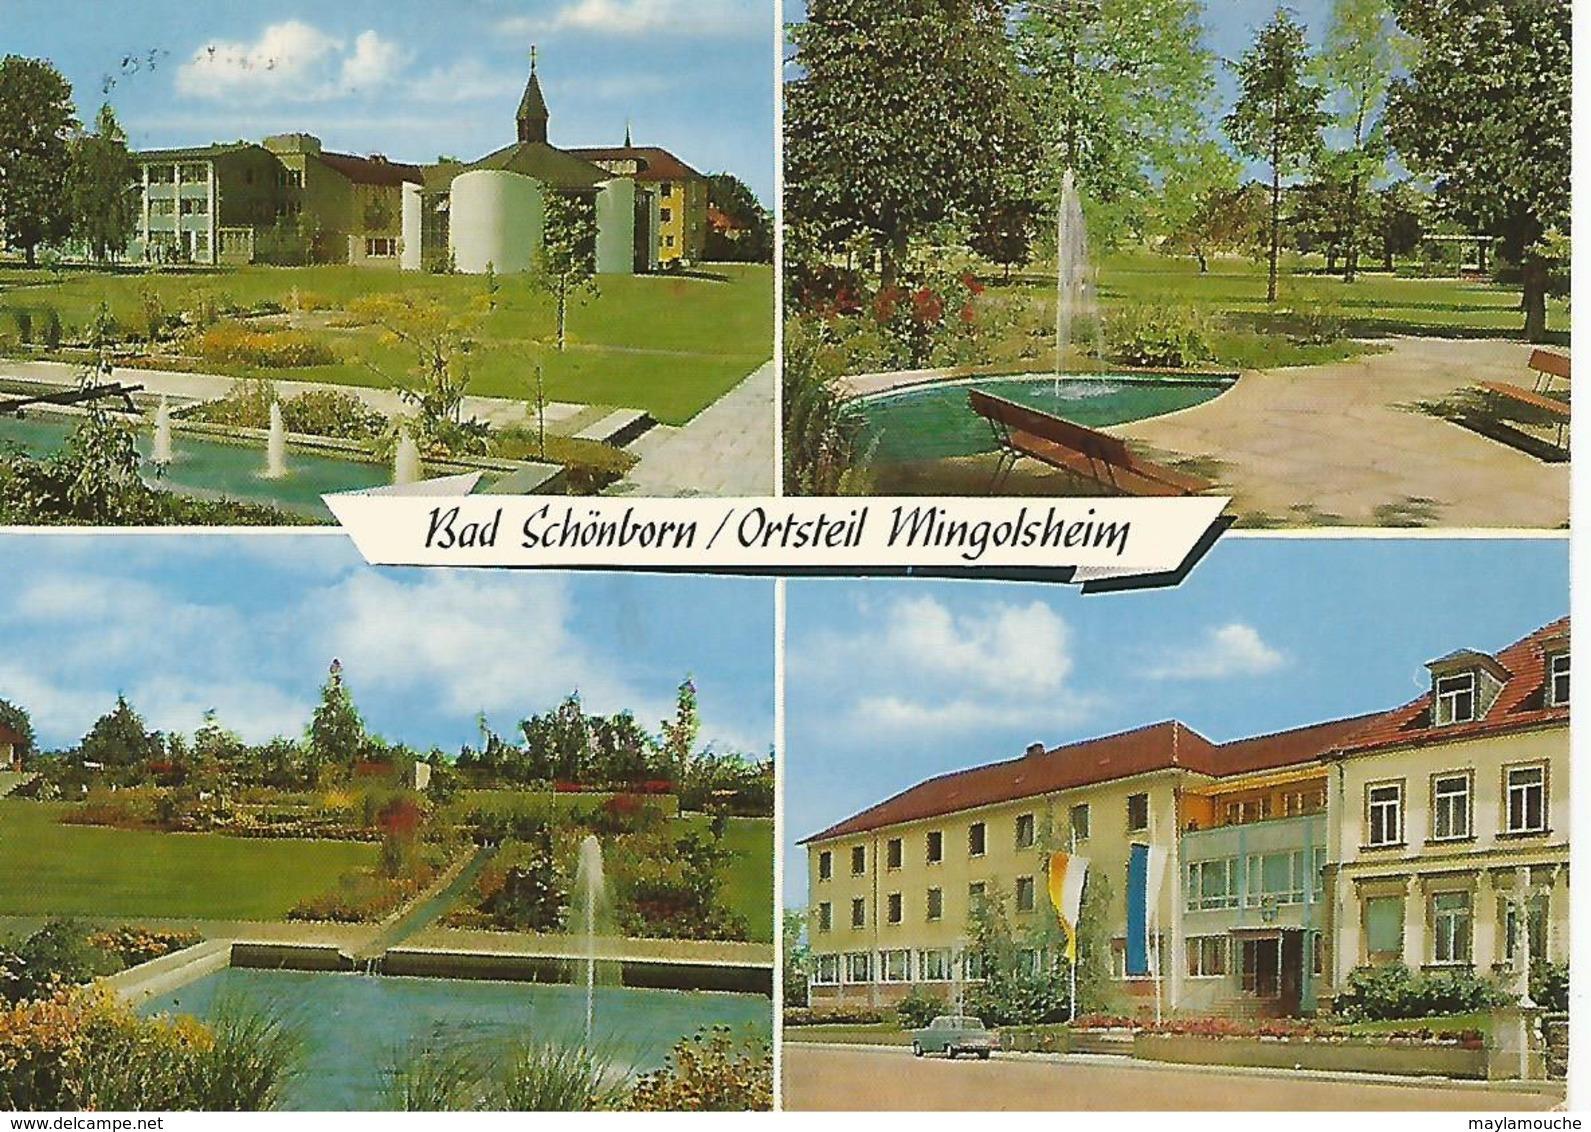 Bad Mingolsheim - Bad Schoenborn